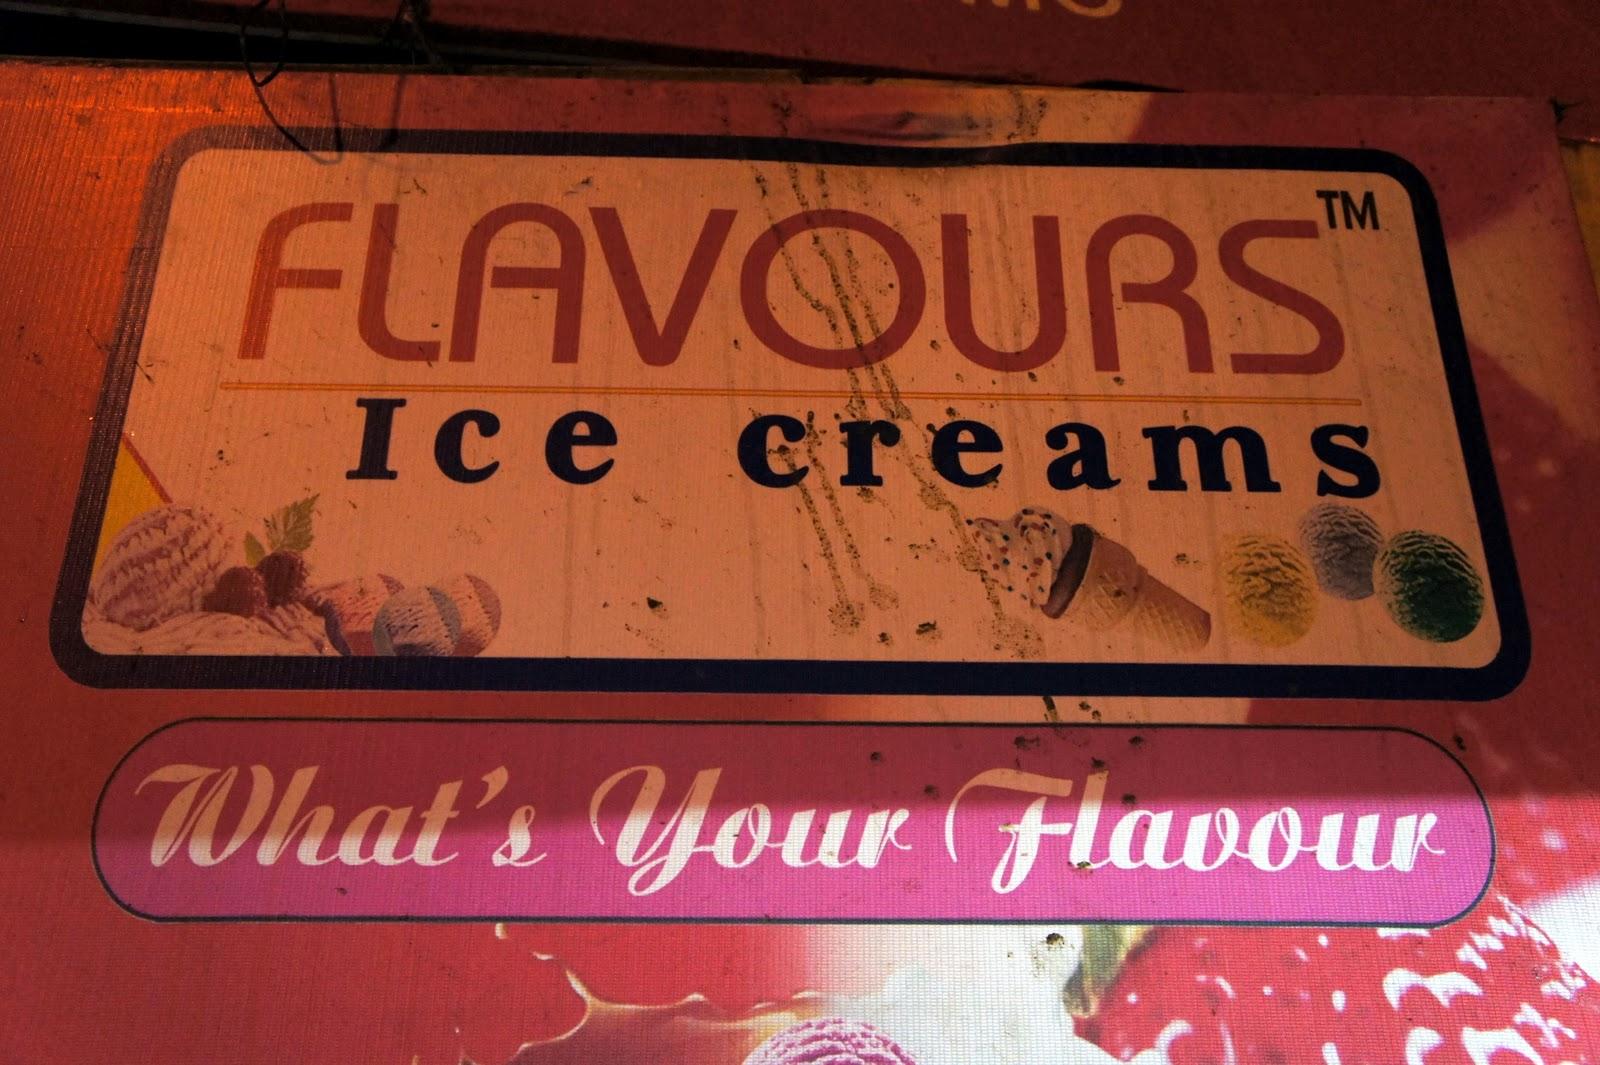 icecreamFlavours